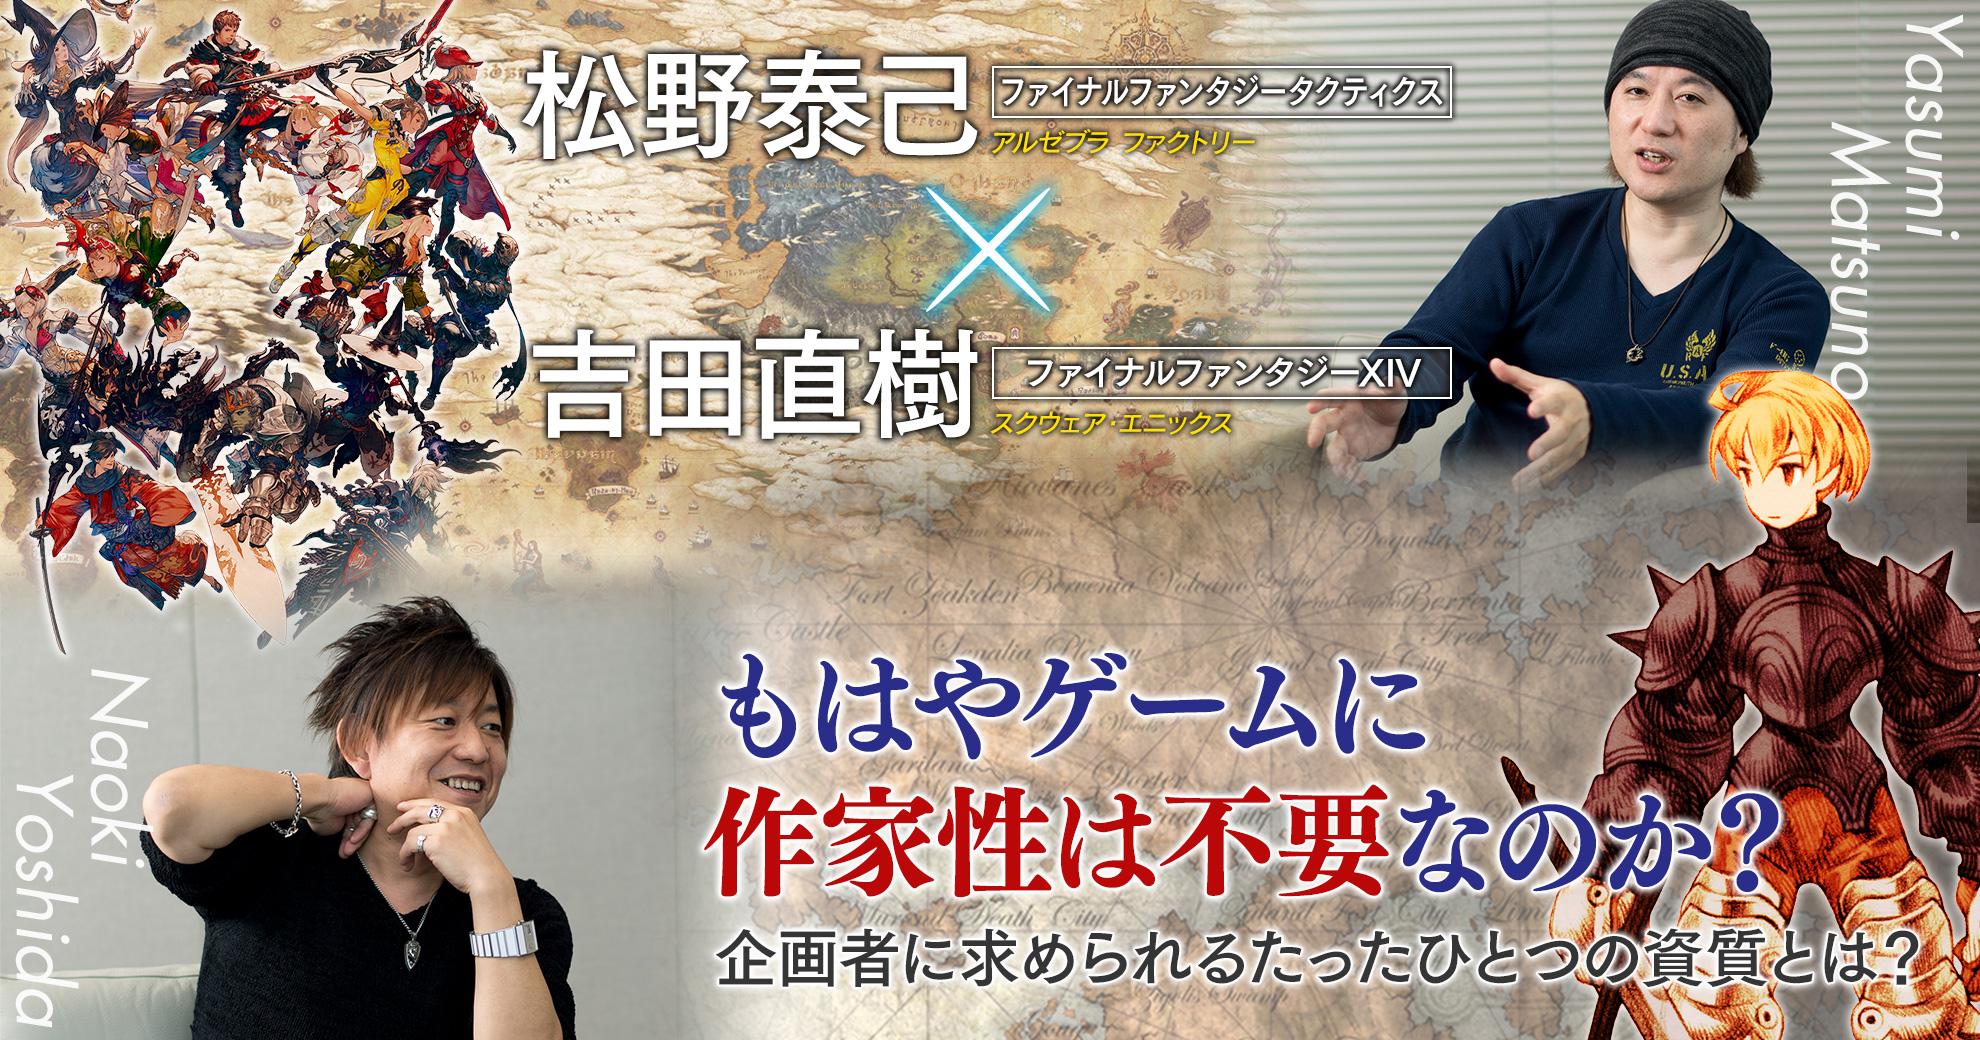 『FFタクティクス』松野泰己✕『FFXIV』吉田直樹対談──もはやゲームに作家性は不要なのか? 企画者に求められるたったひとつの資質とは?